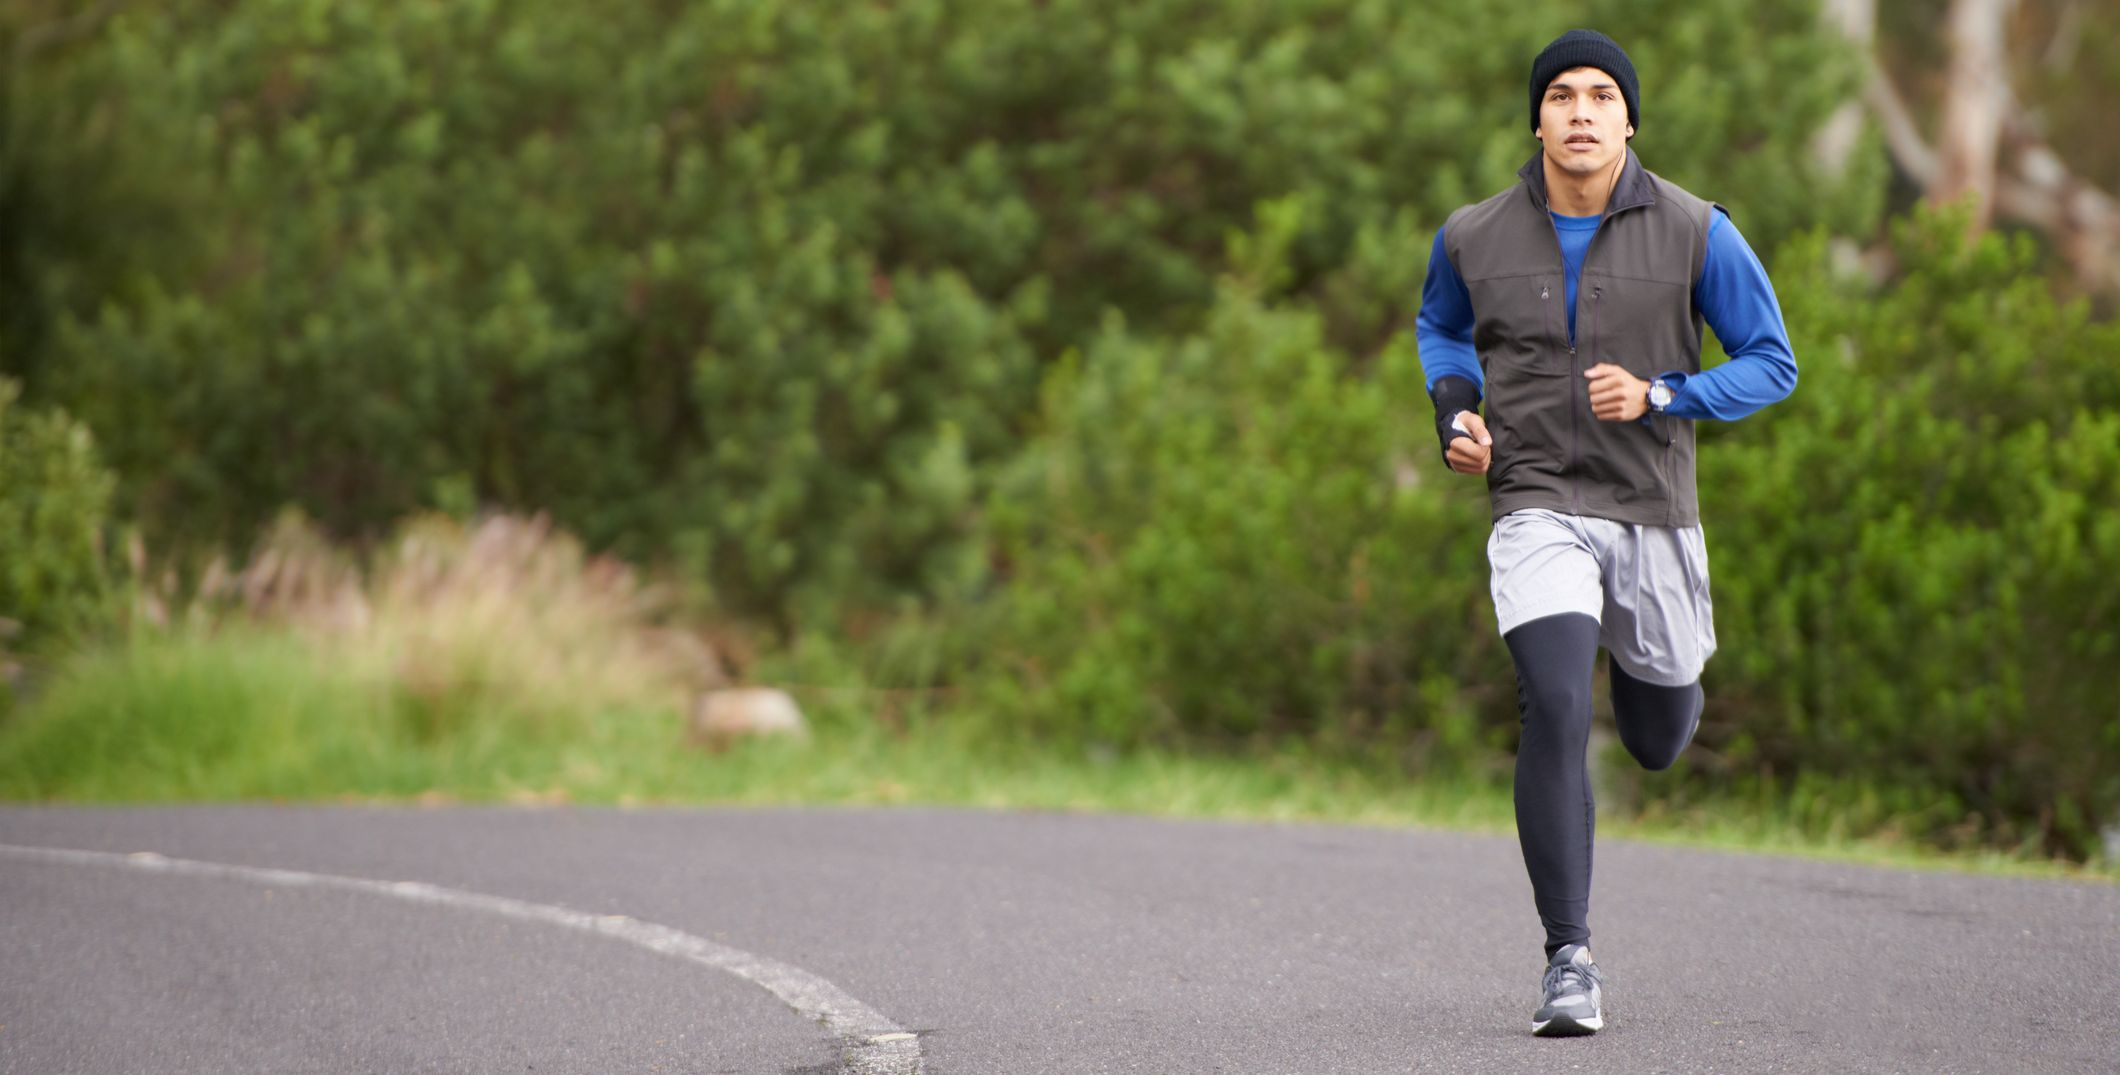 focused man running